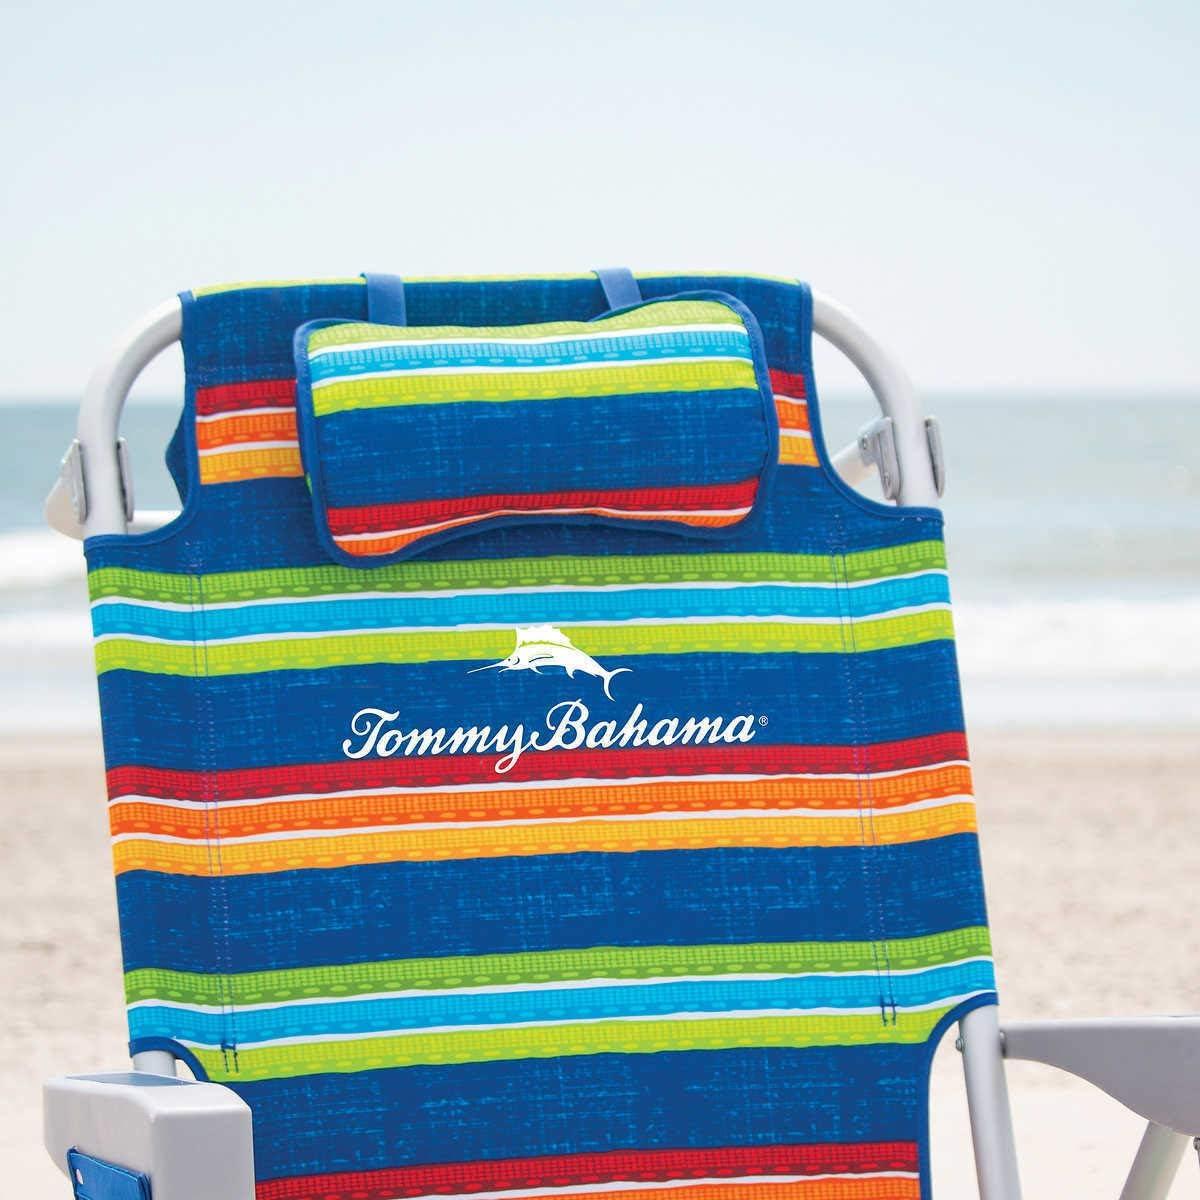 TECNOVOZ Silla Playa Plegable Asas Tipo Mochila Tommy Bahamas 2000998 Rayas ….